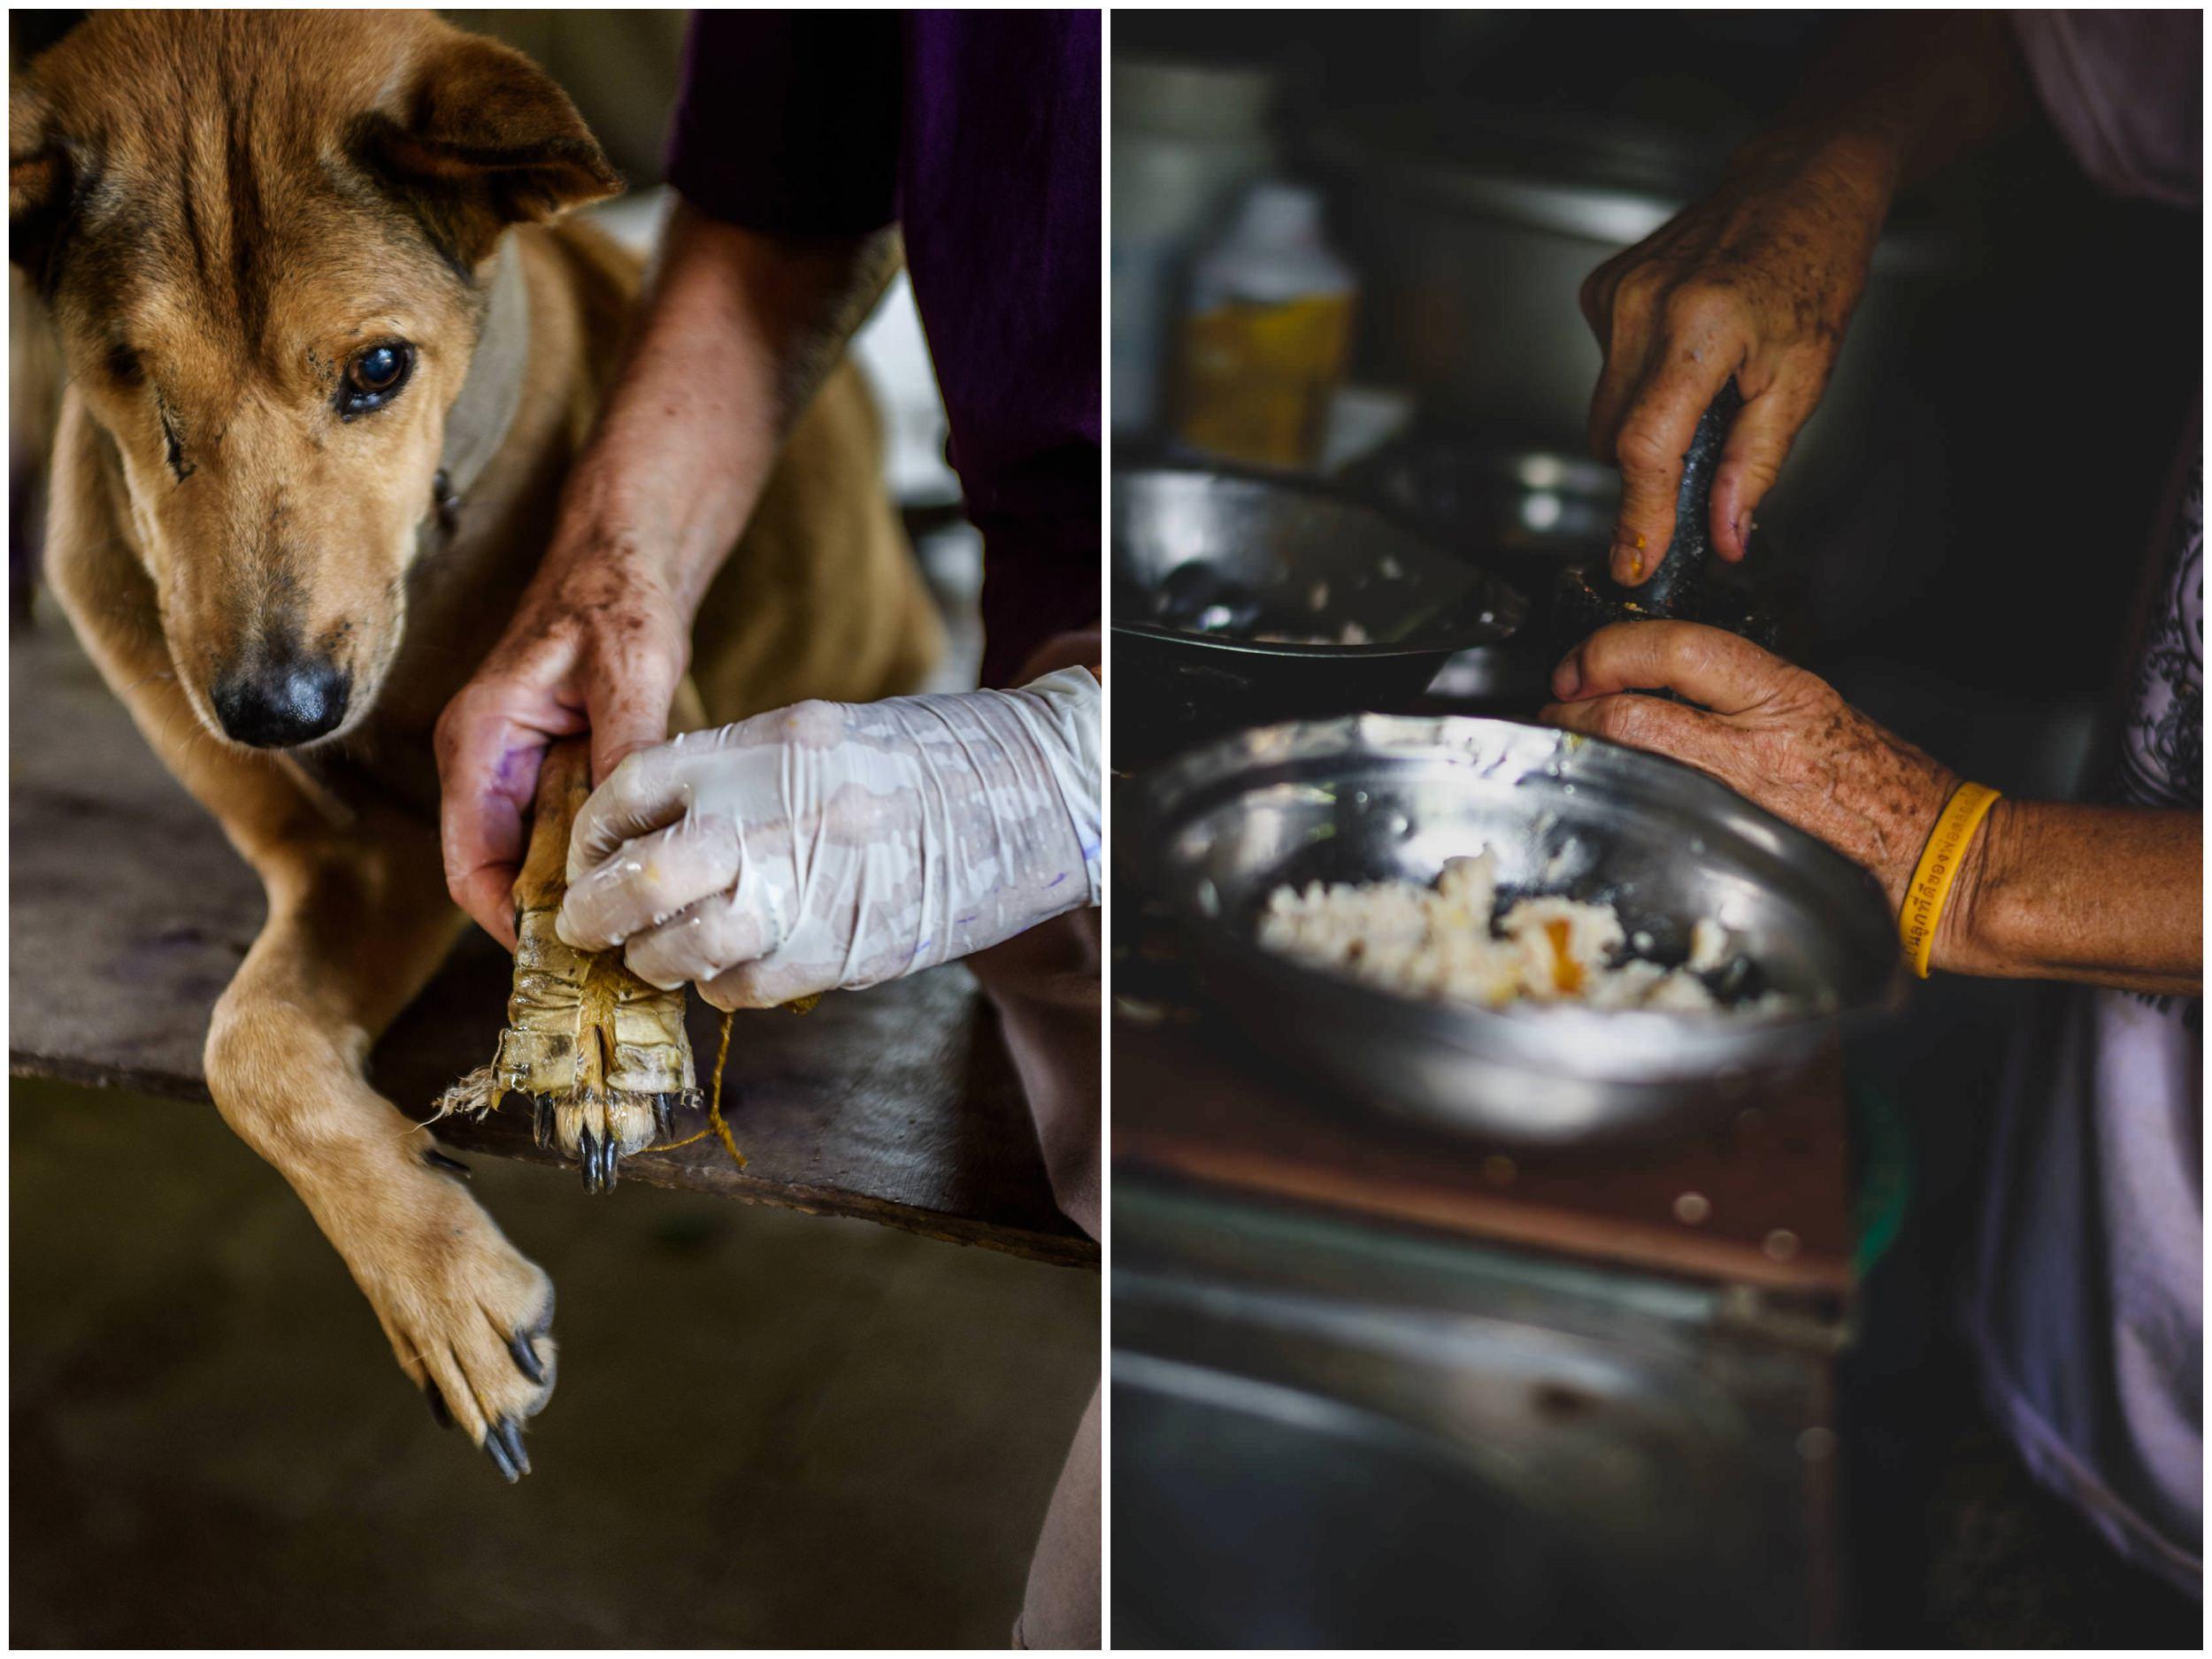 Headrock, dogs, shelter, rescue, people, hands, compassion, care, bang saphan, thailand, honden, straathonden, opvangcentrum, rehabilitatie, rehabilitation, asiel, verzorging, compassie, suthep sankuntod, hurricane tep, verity cattanach poole